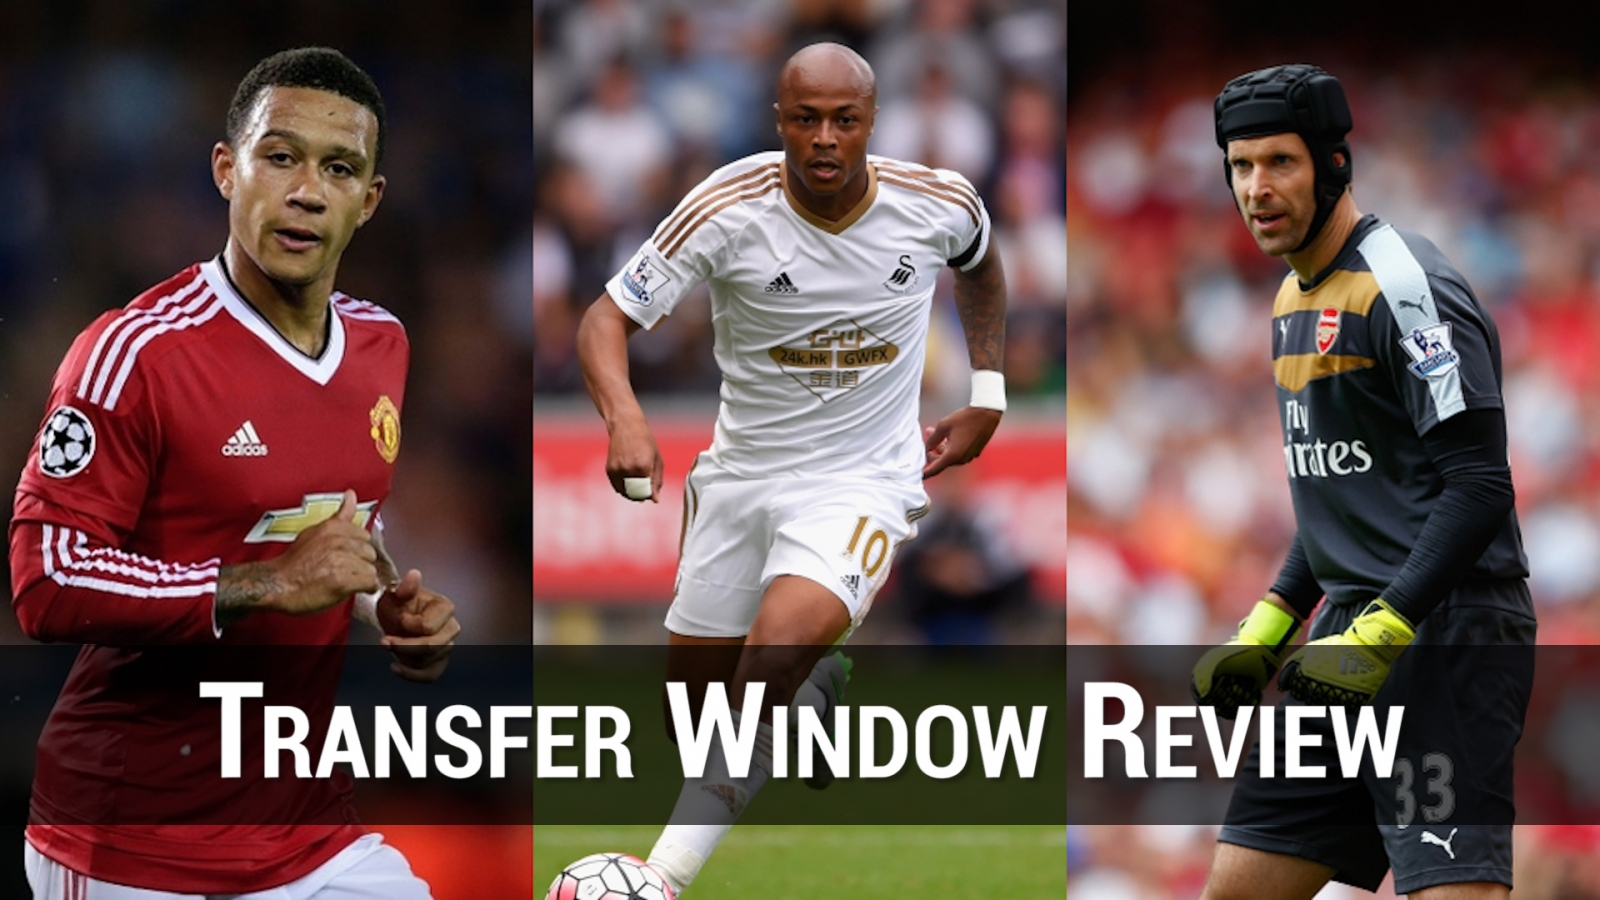 Transfer window review